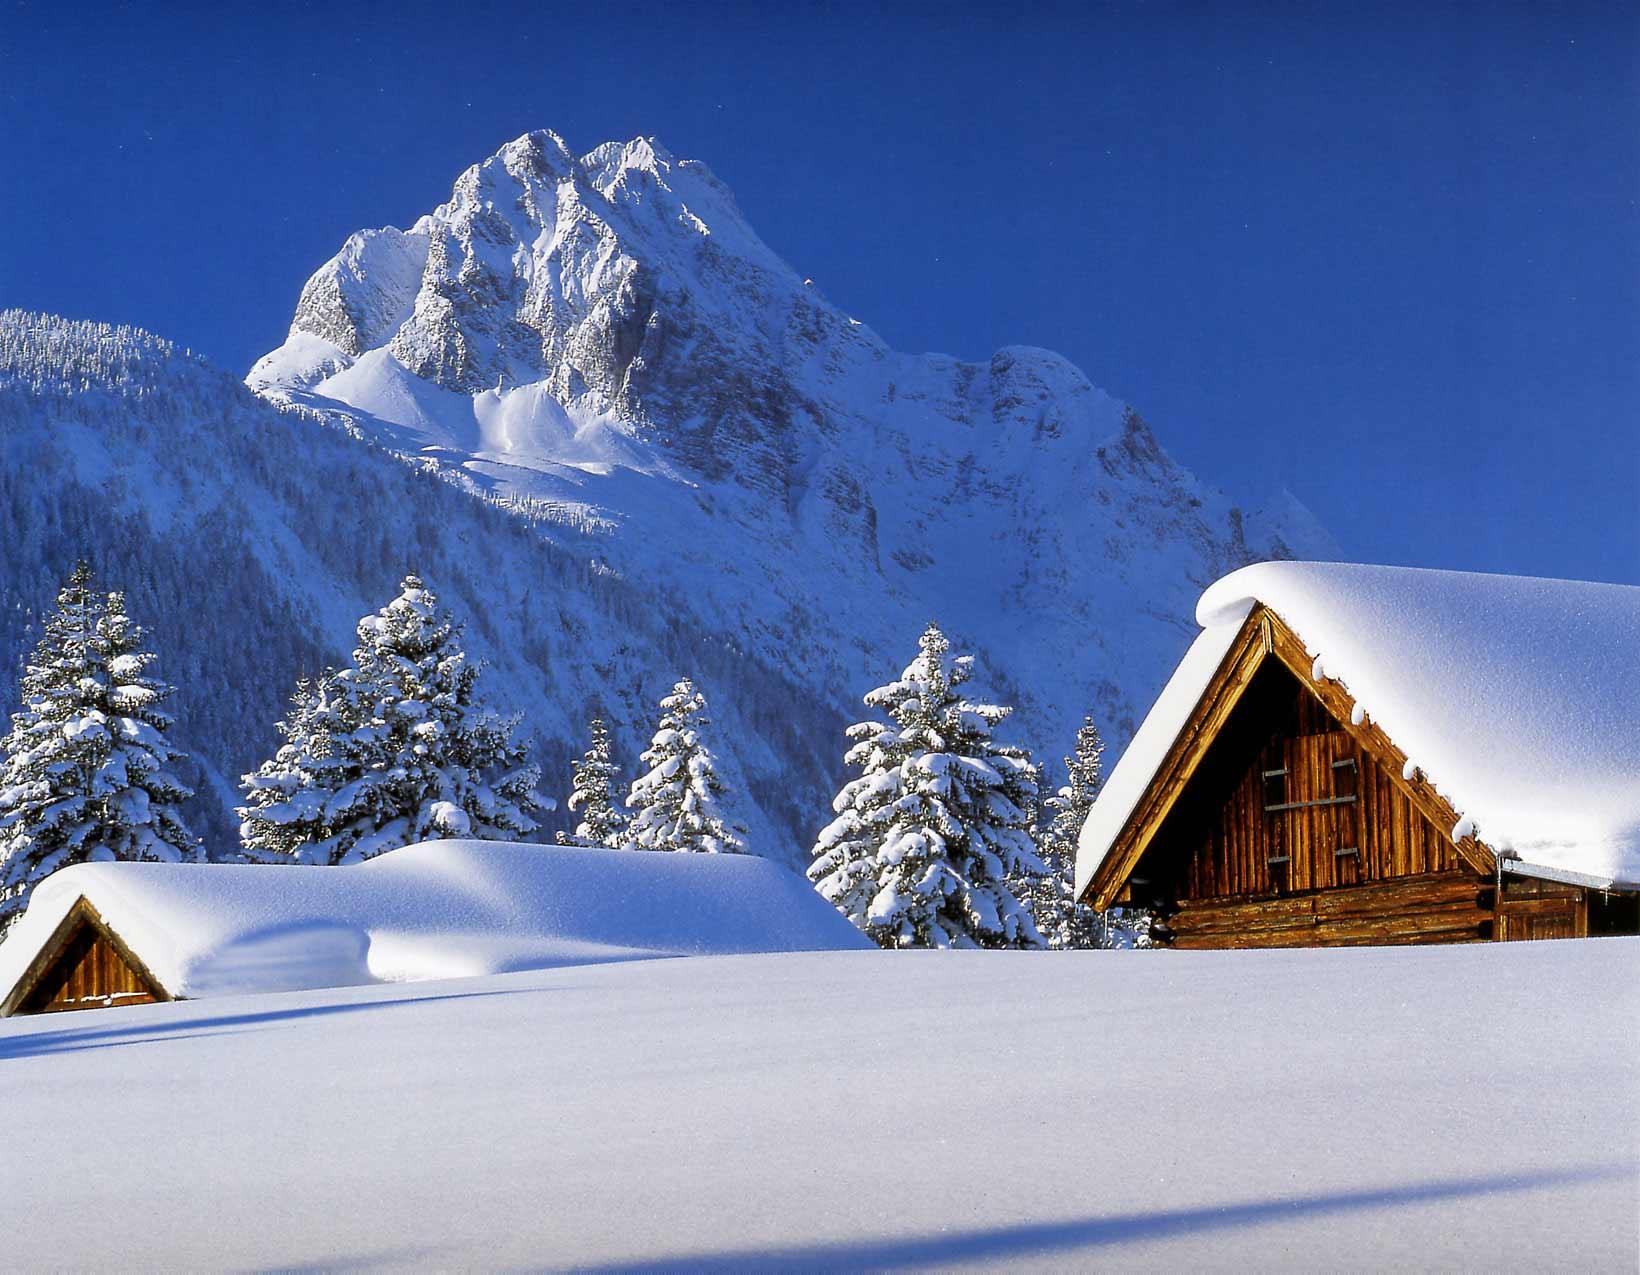 30 Beautiful Winter Wallpaper For Desktop 1640x1275